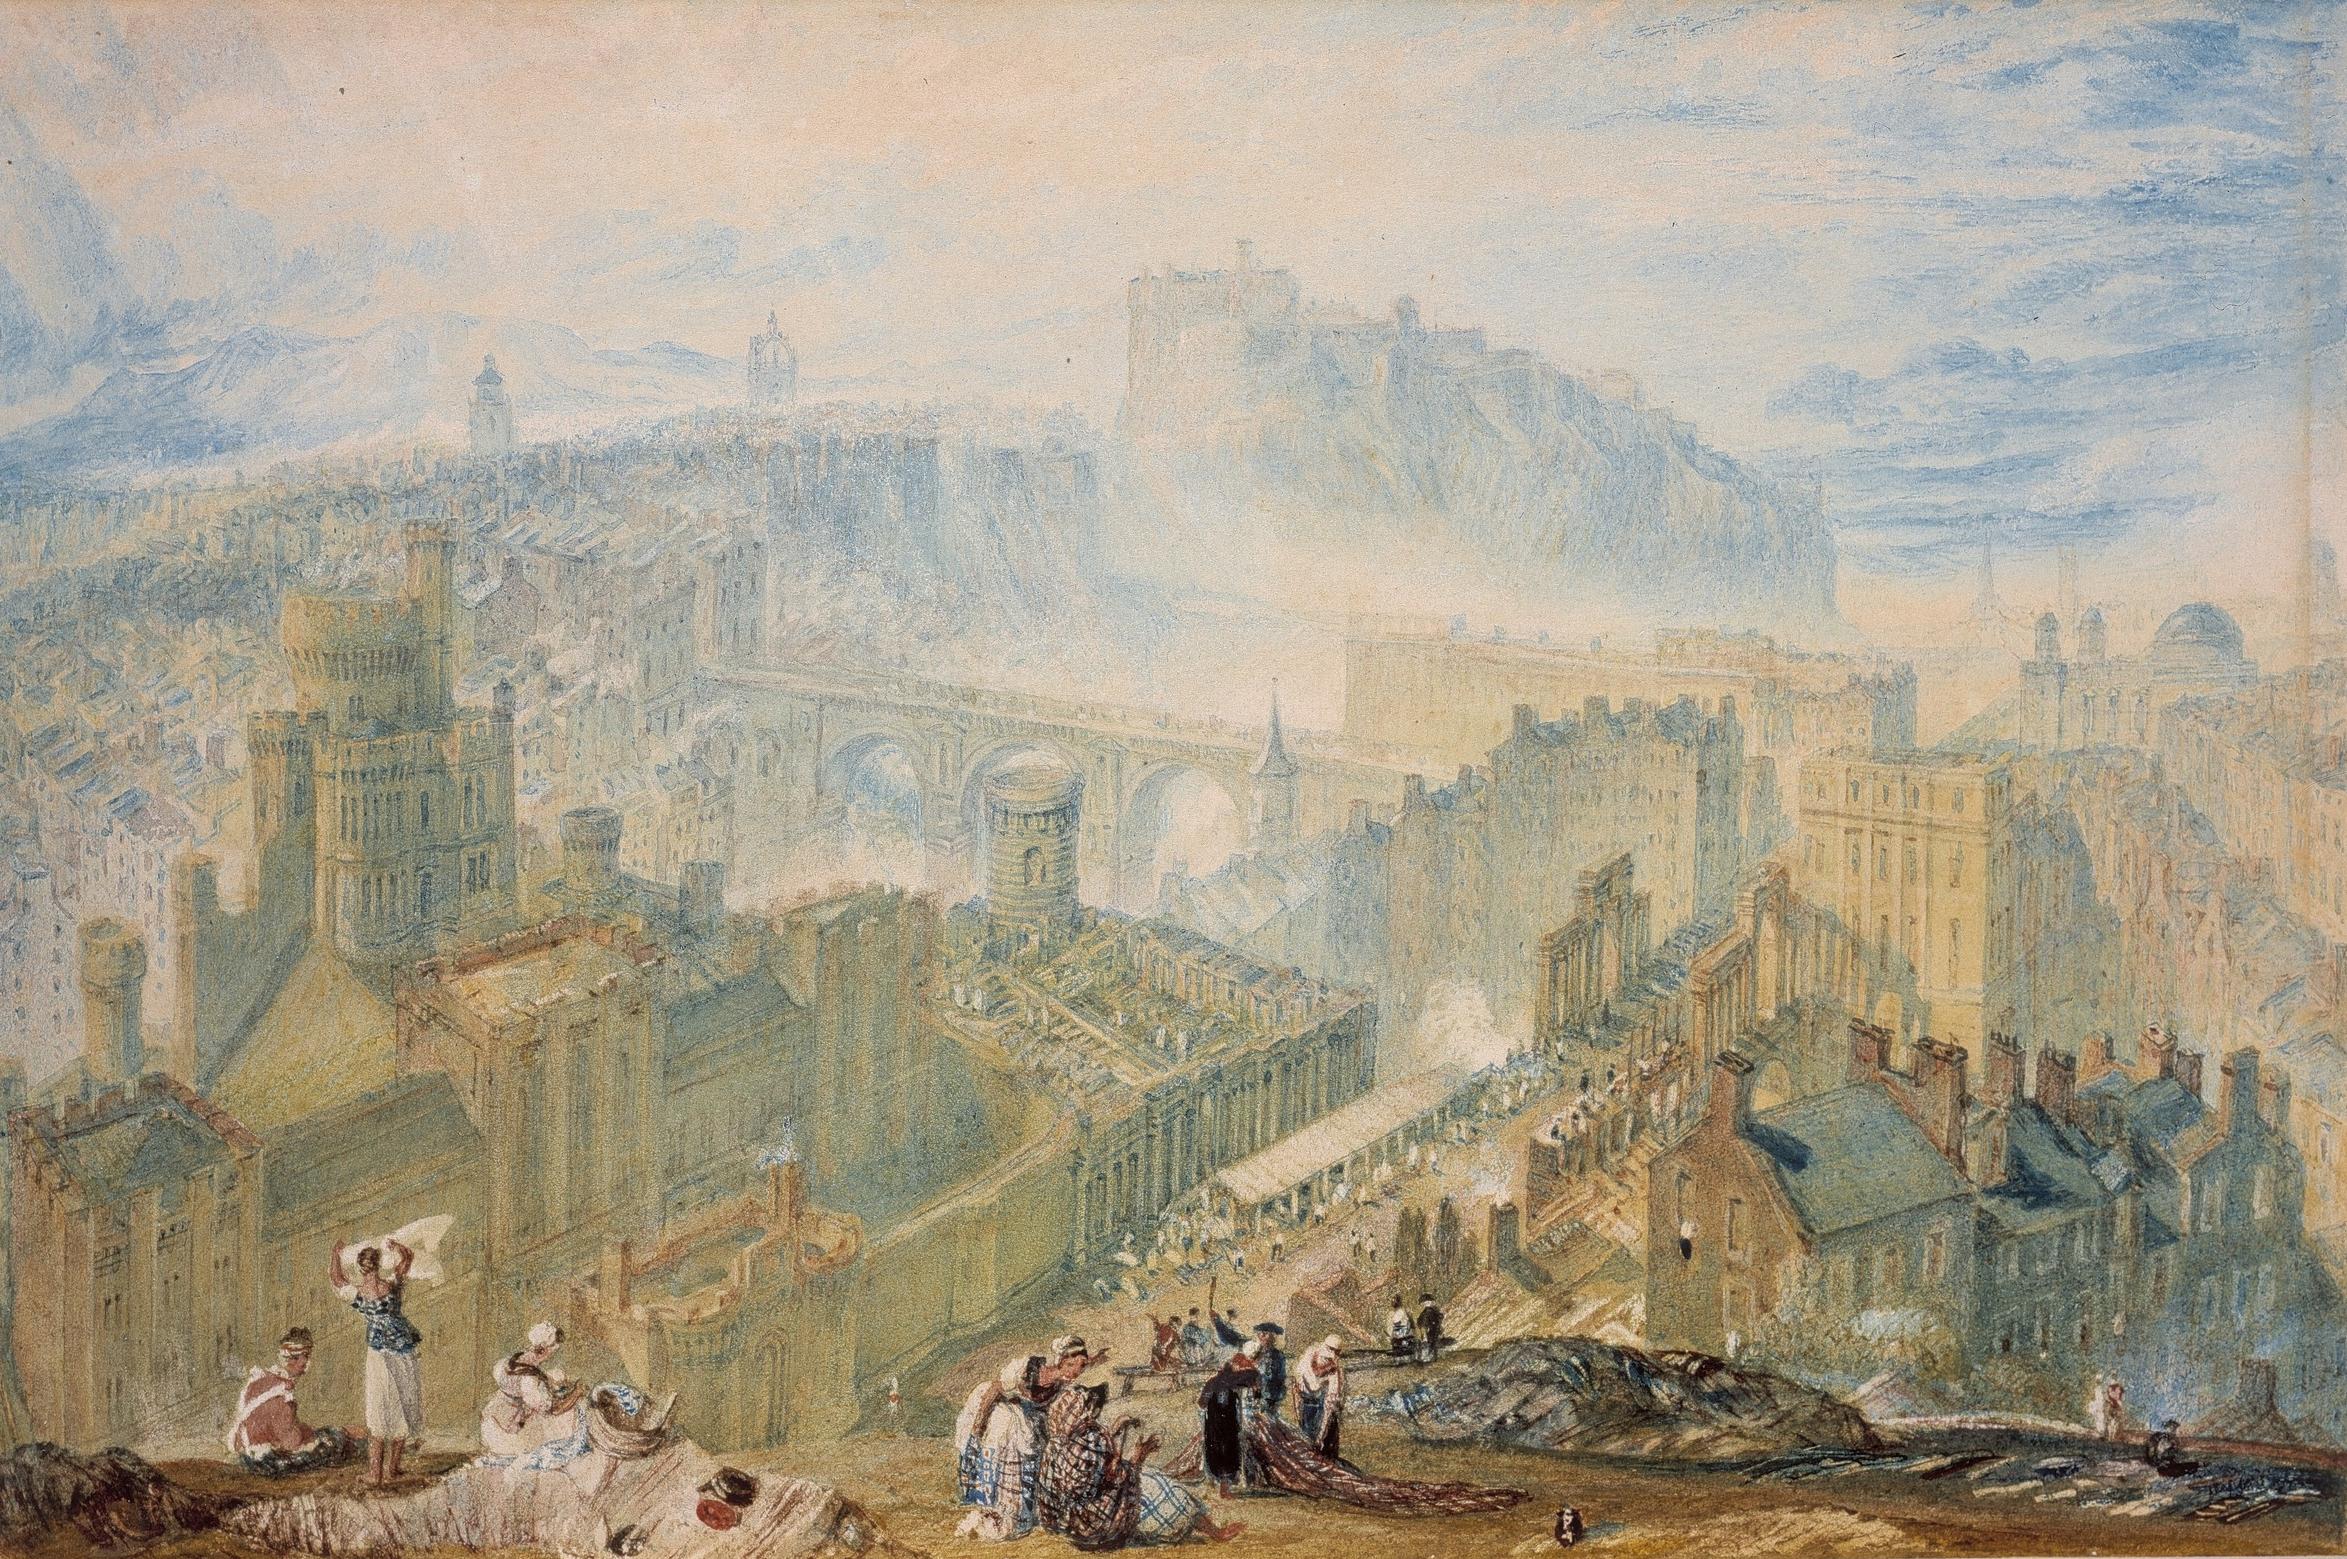 Edinburgh from Calton HIll , William Turner, courtesy of Scottish National Gallery.